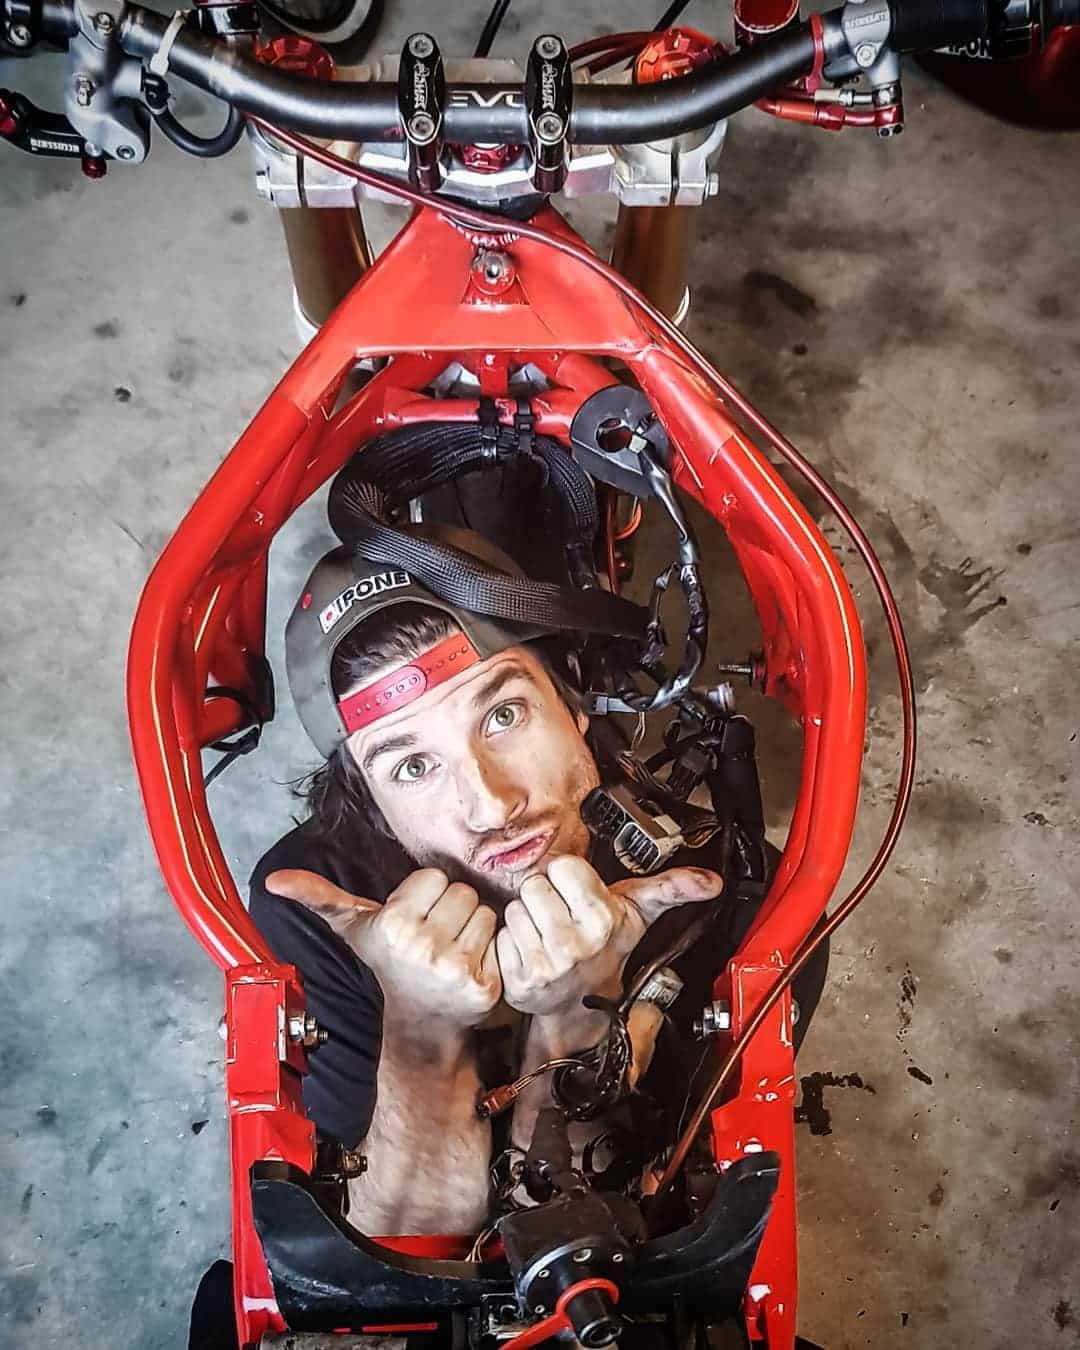 moto sans moteur ©Romain Jeandrot